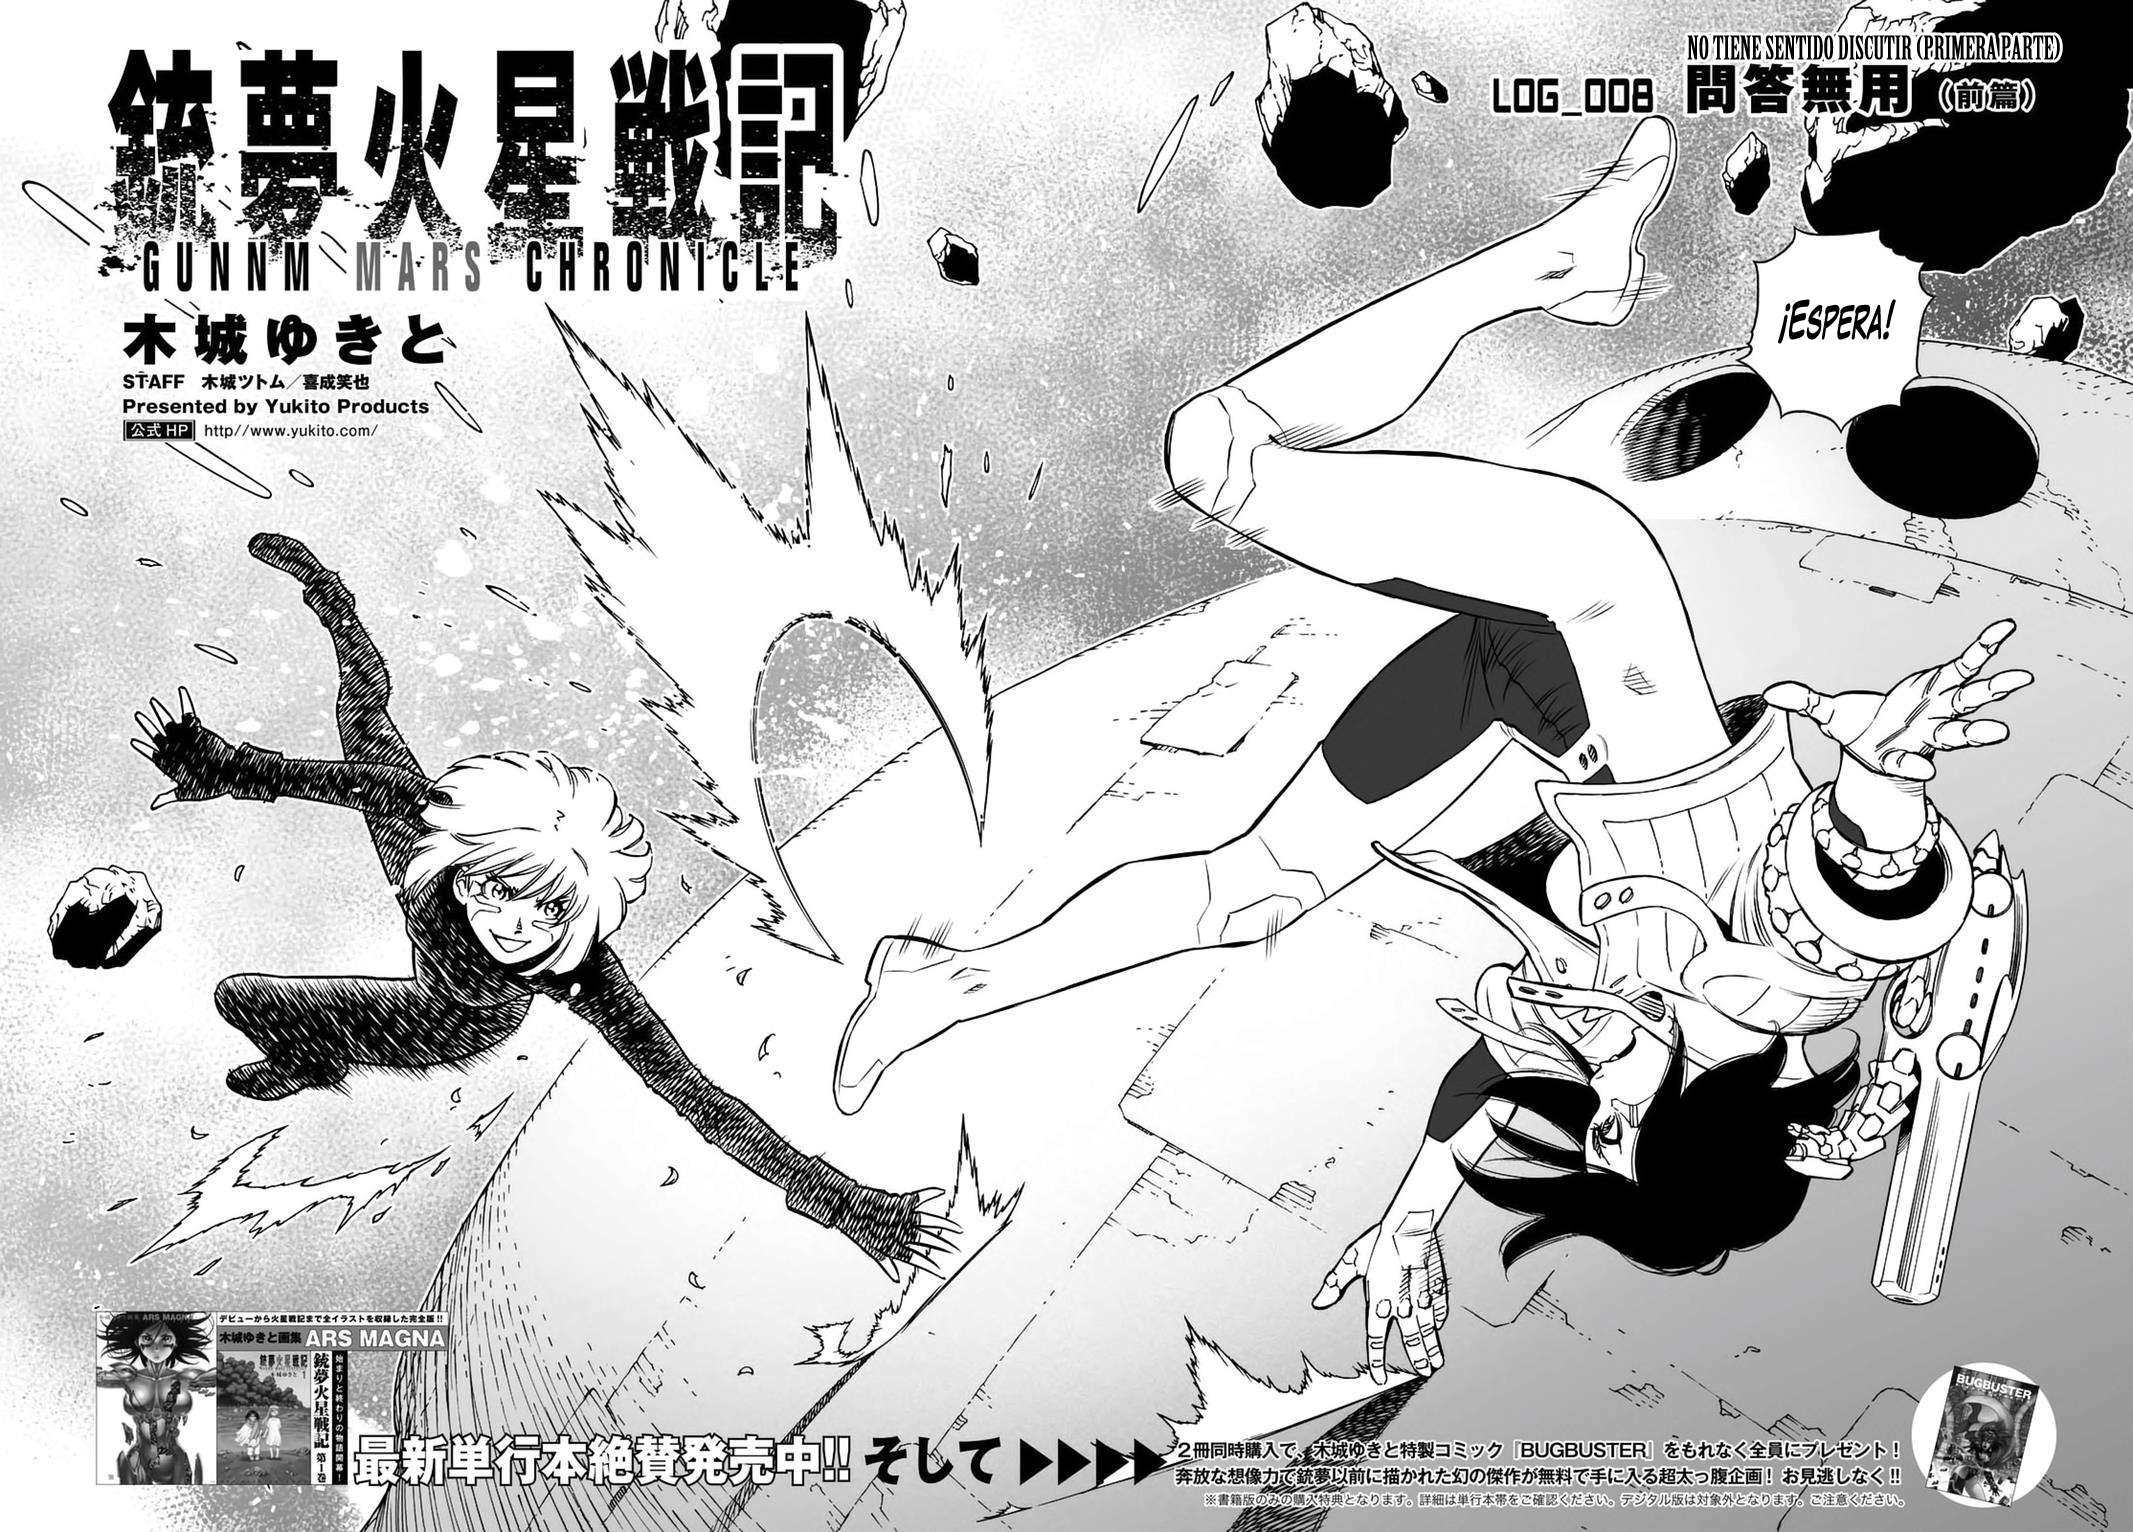 https://c5.ninemanga.com/es_manga/41/18217/423018/3e1983b5300a981a621c67fd58eec569.jpg Page 2